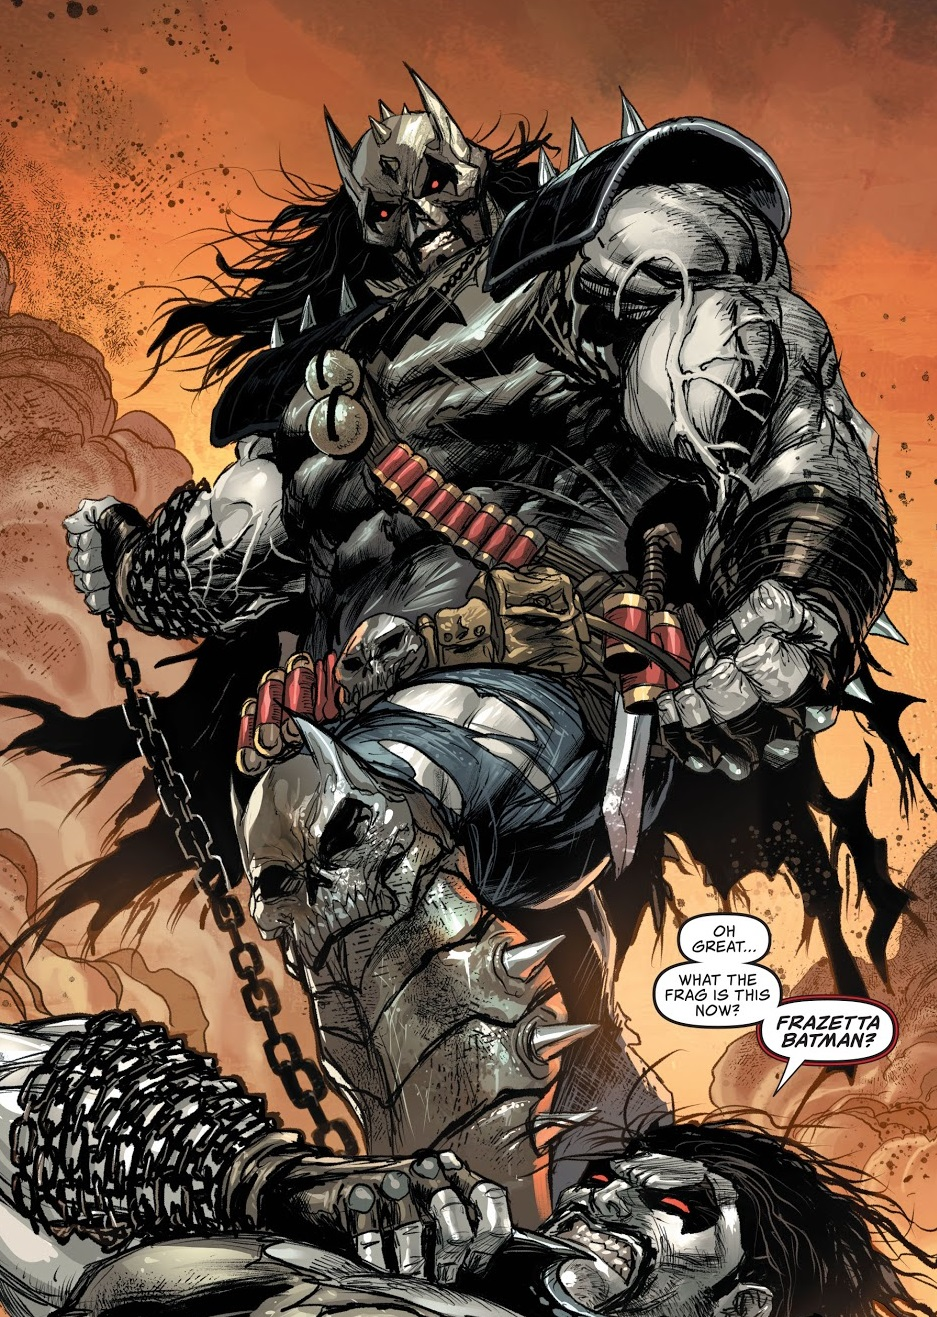 Batman Who Frags (Dark Multiverse)